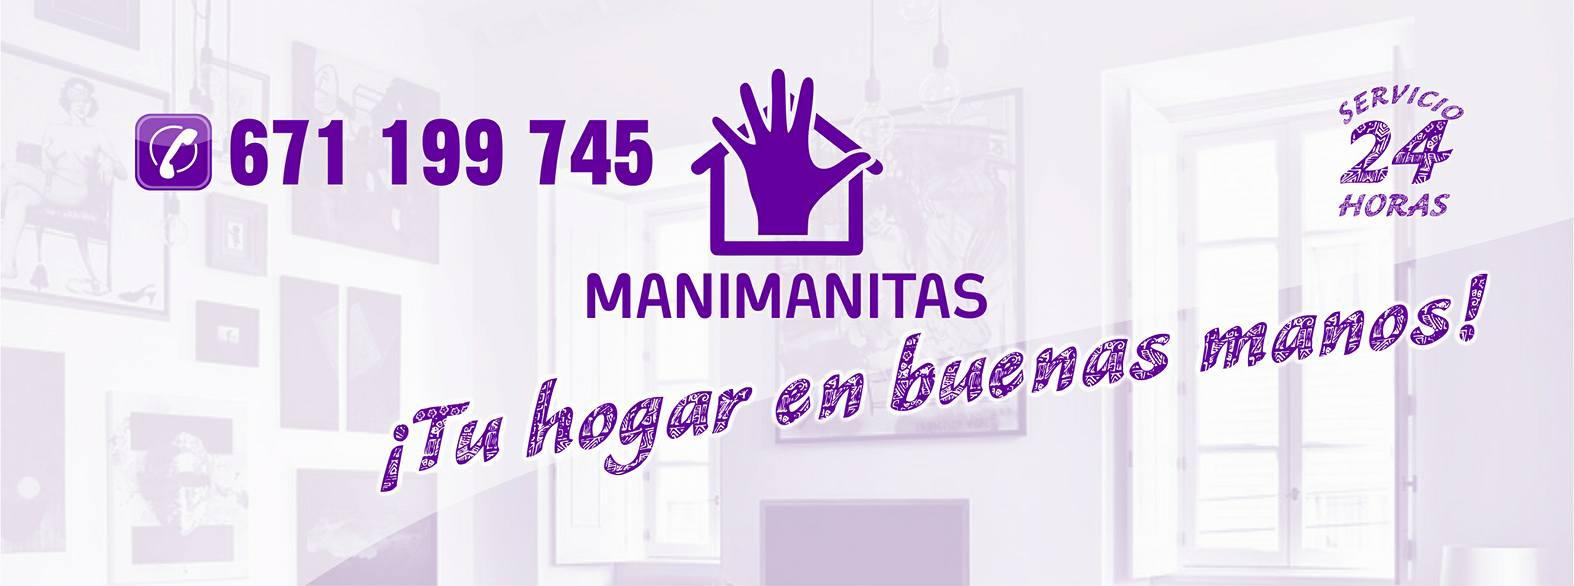 Reformas Cáceres Manimanitas 24h